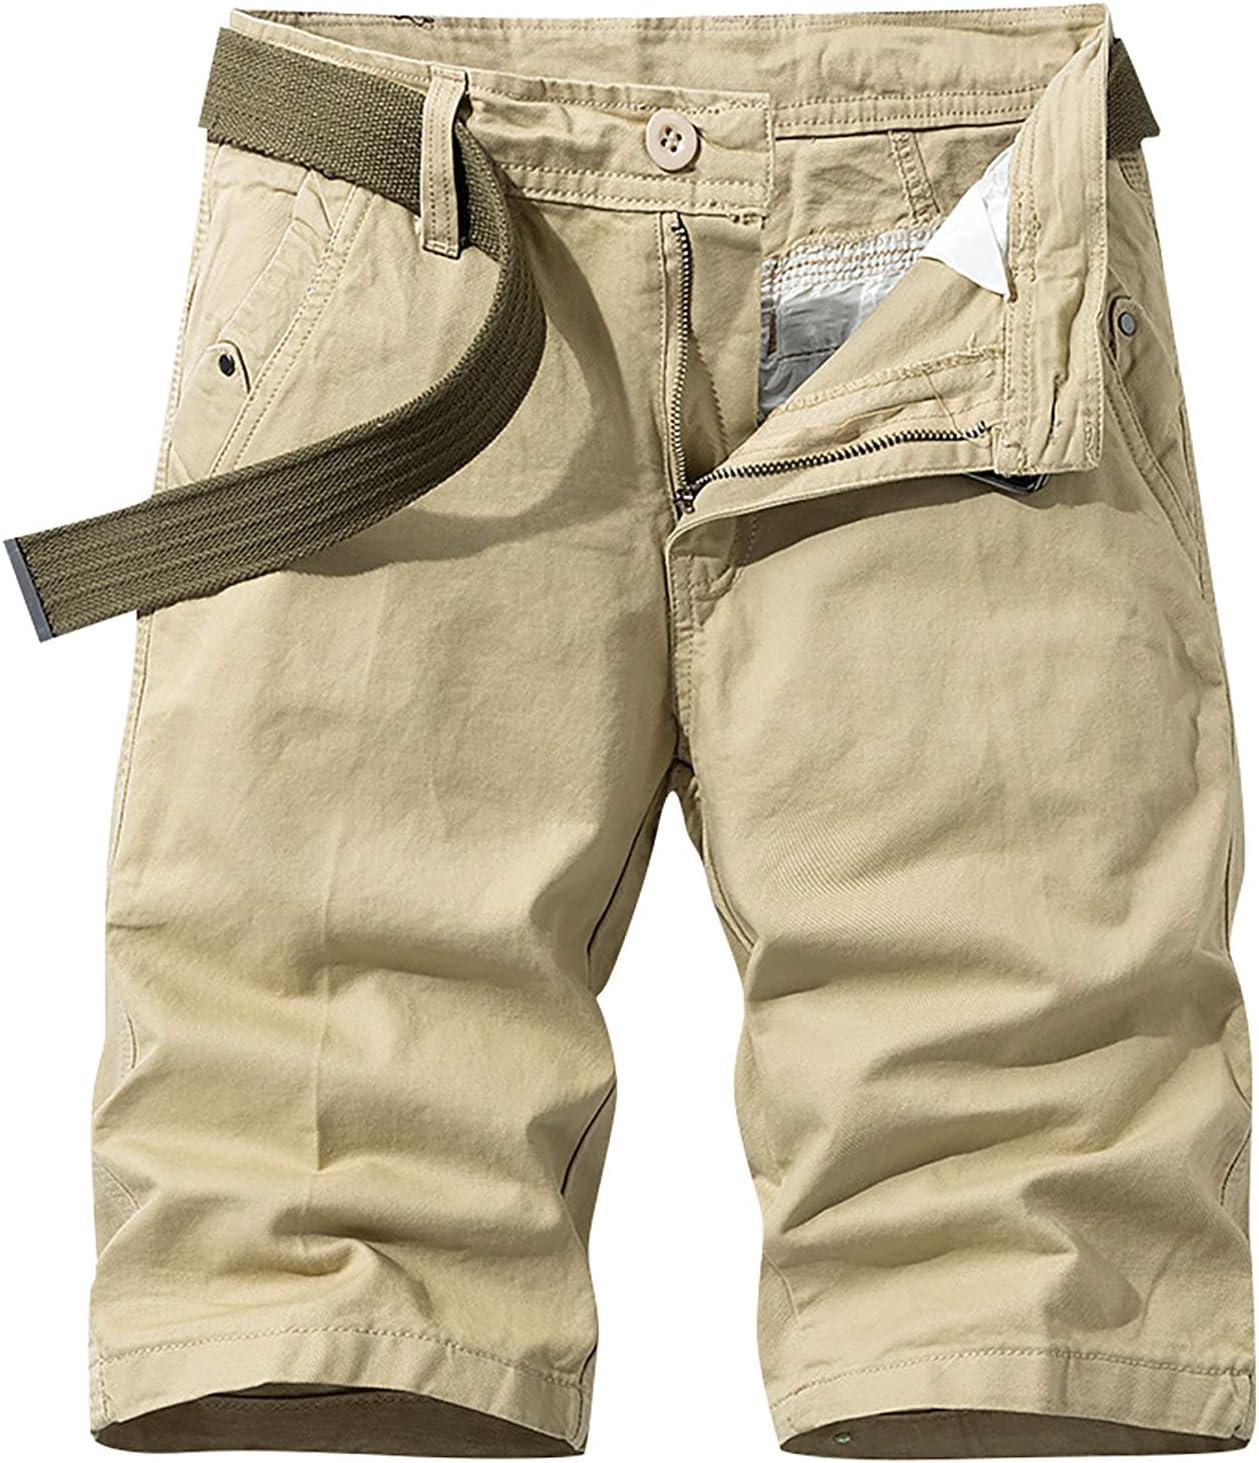 Navyoom Men's Casual Cargo Shorts, Quick Dry Workout Jogger Boardshorts, Loose Fit Half Pant Working Basic Shorts